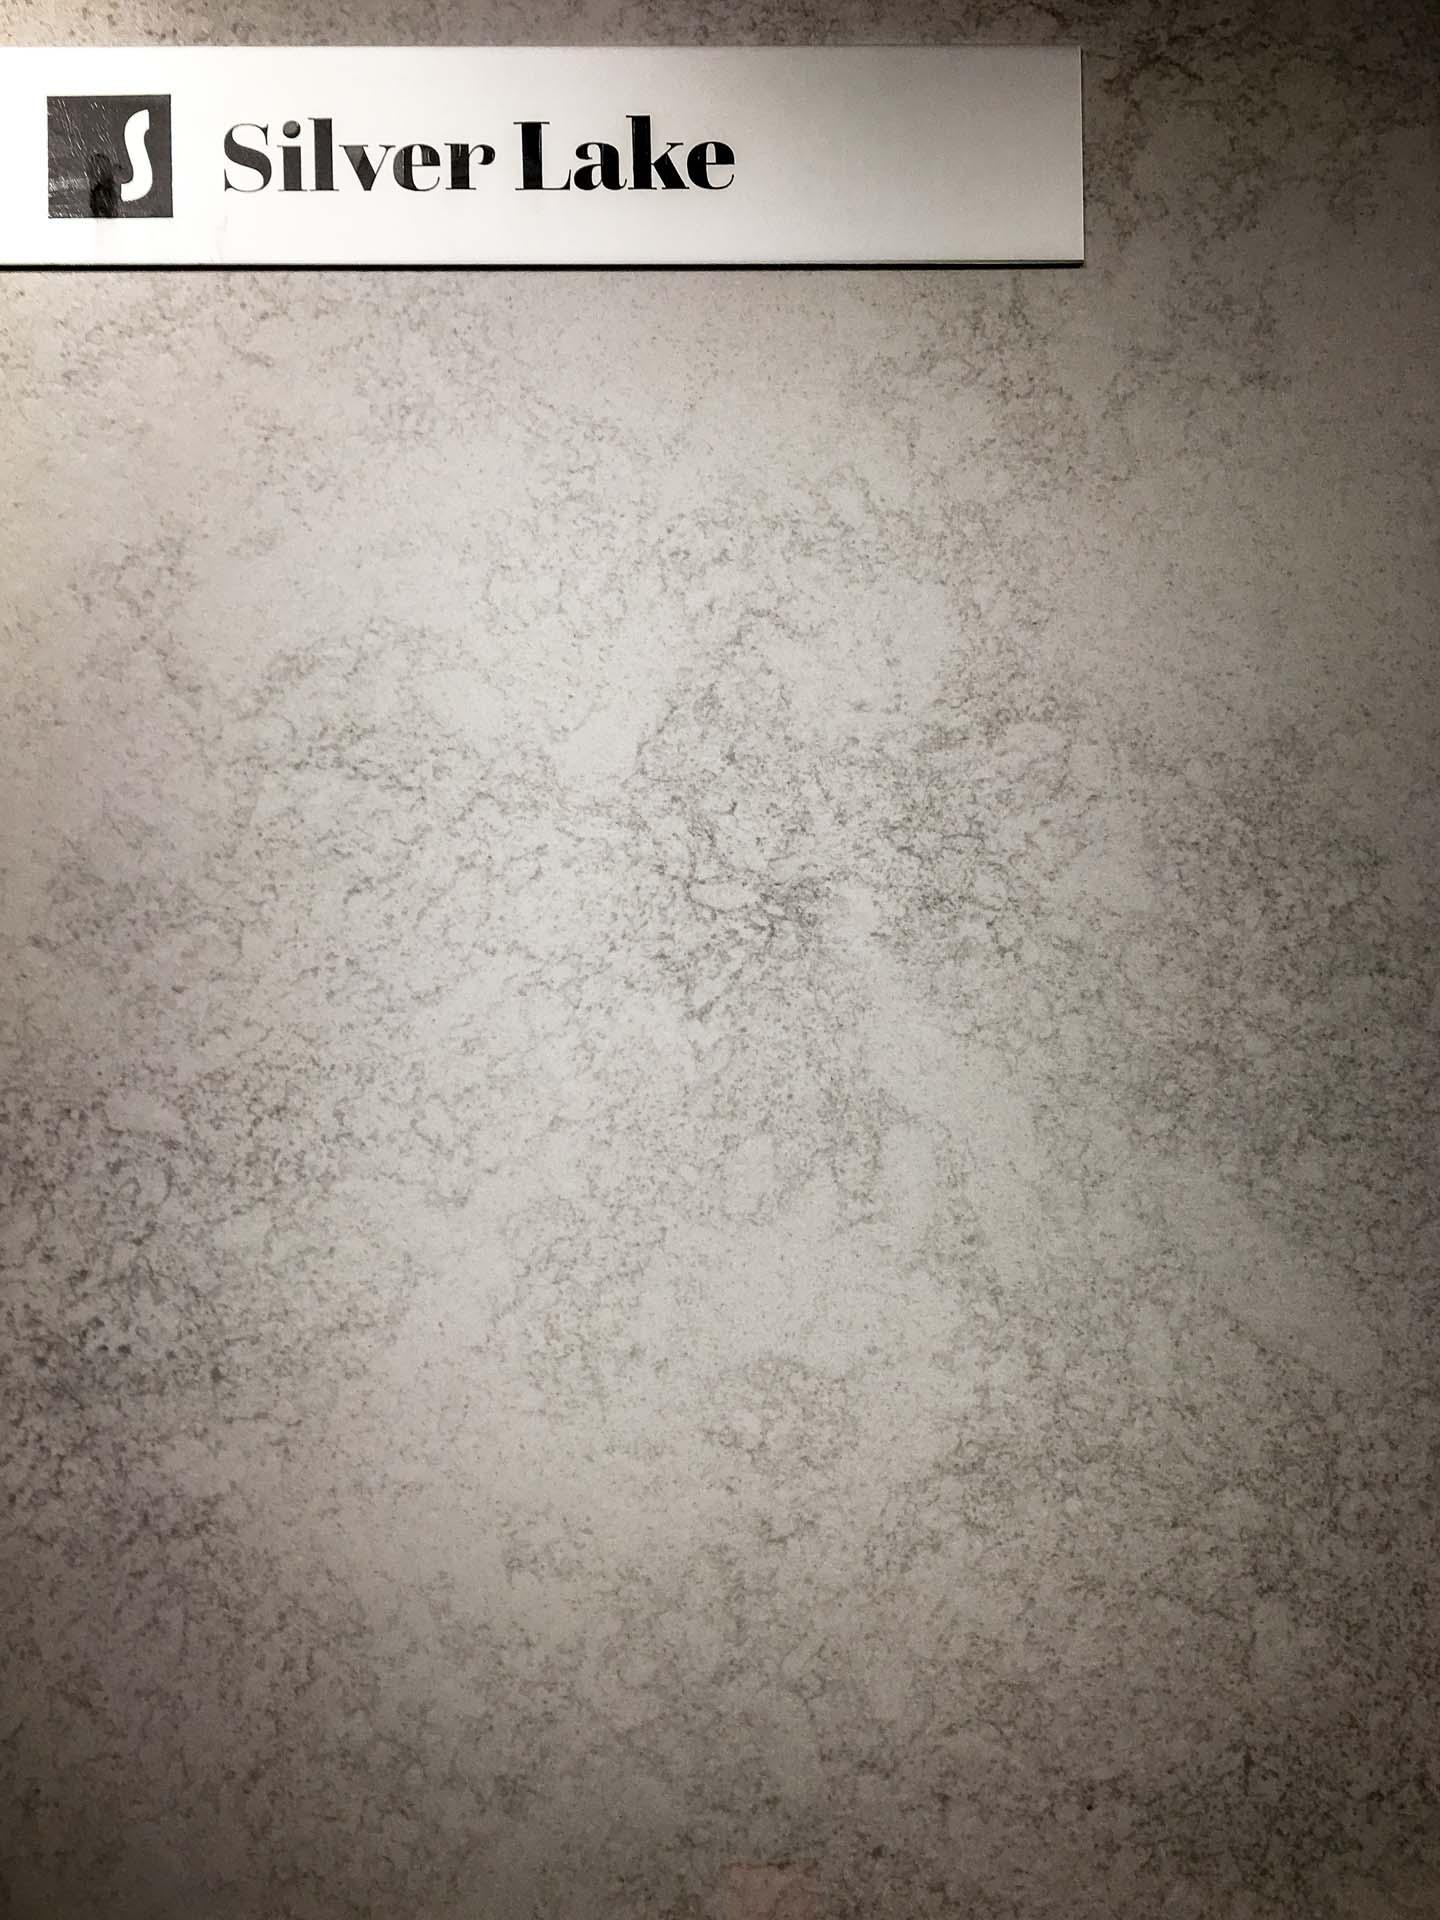 cosentino visit hook 2018 surrey quartz worktops silestone 204641 a